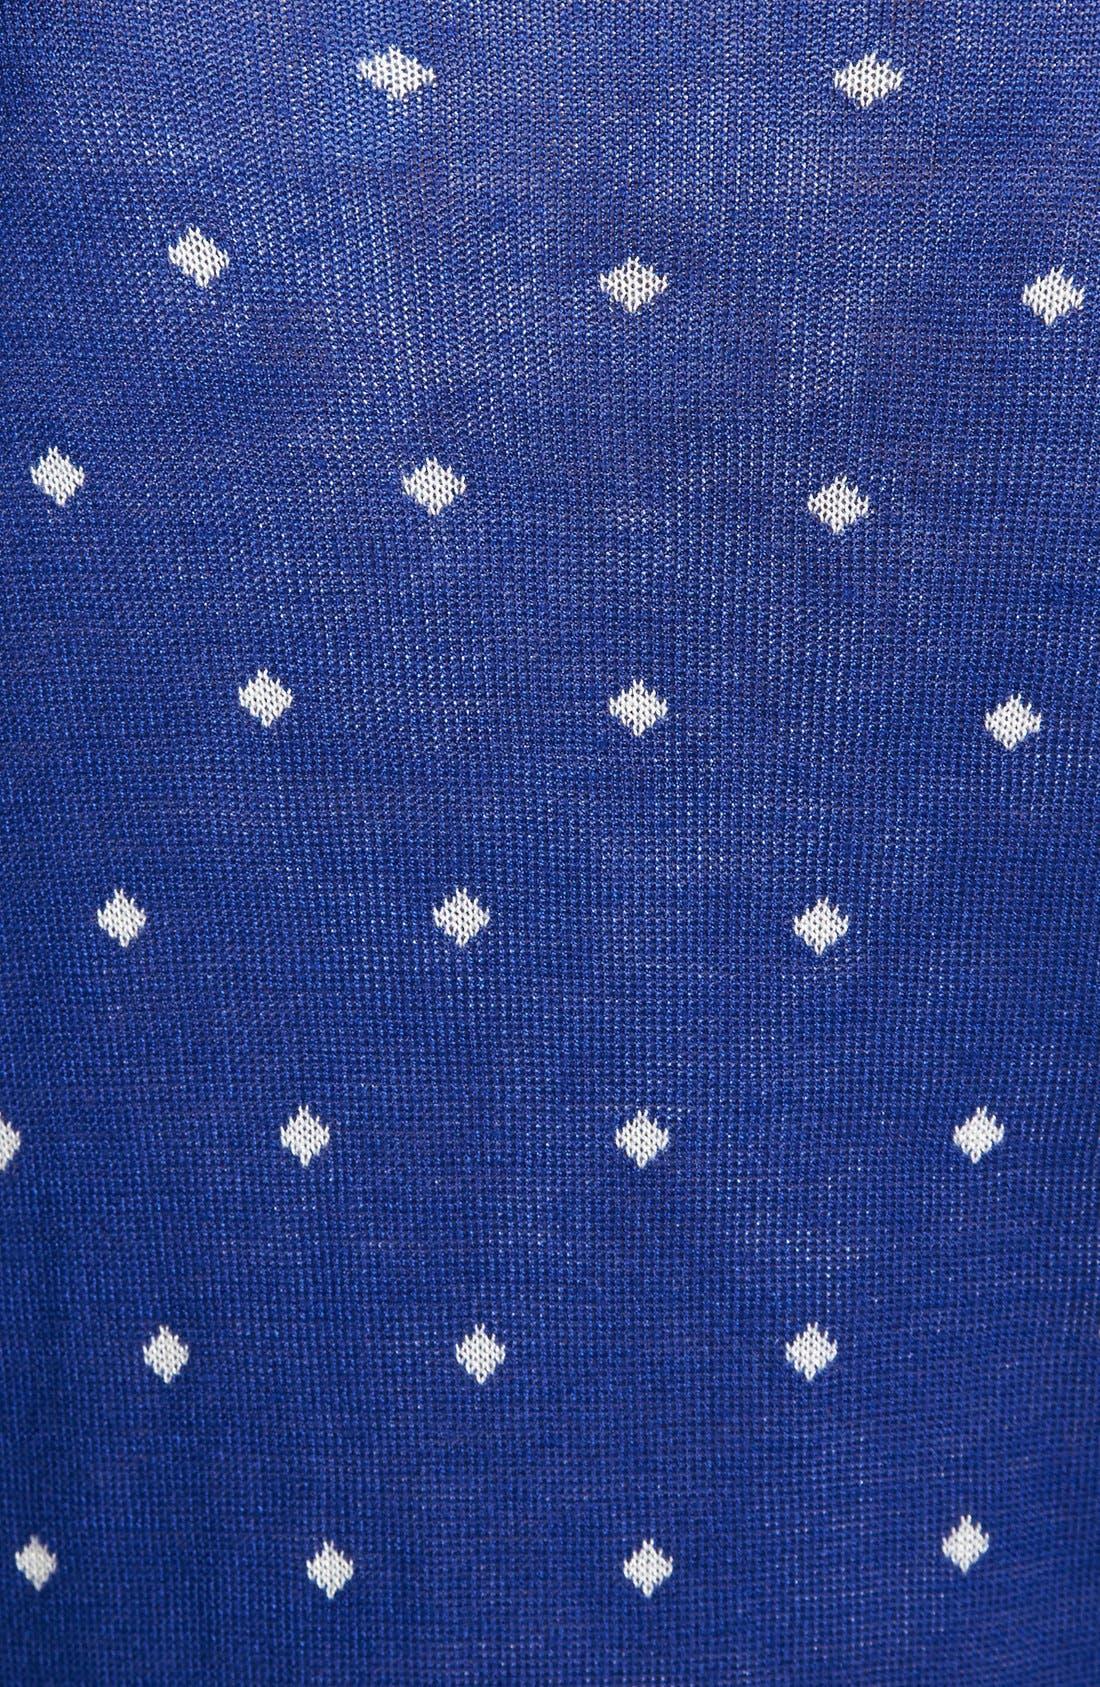 Alternate Image 3  - kensie Diamond Pattern Crewneck Sweater with Shirttail Hem